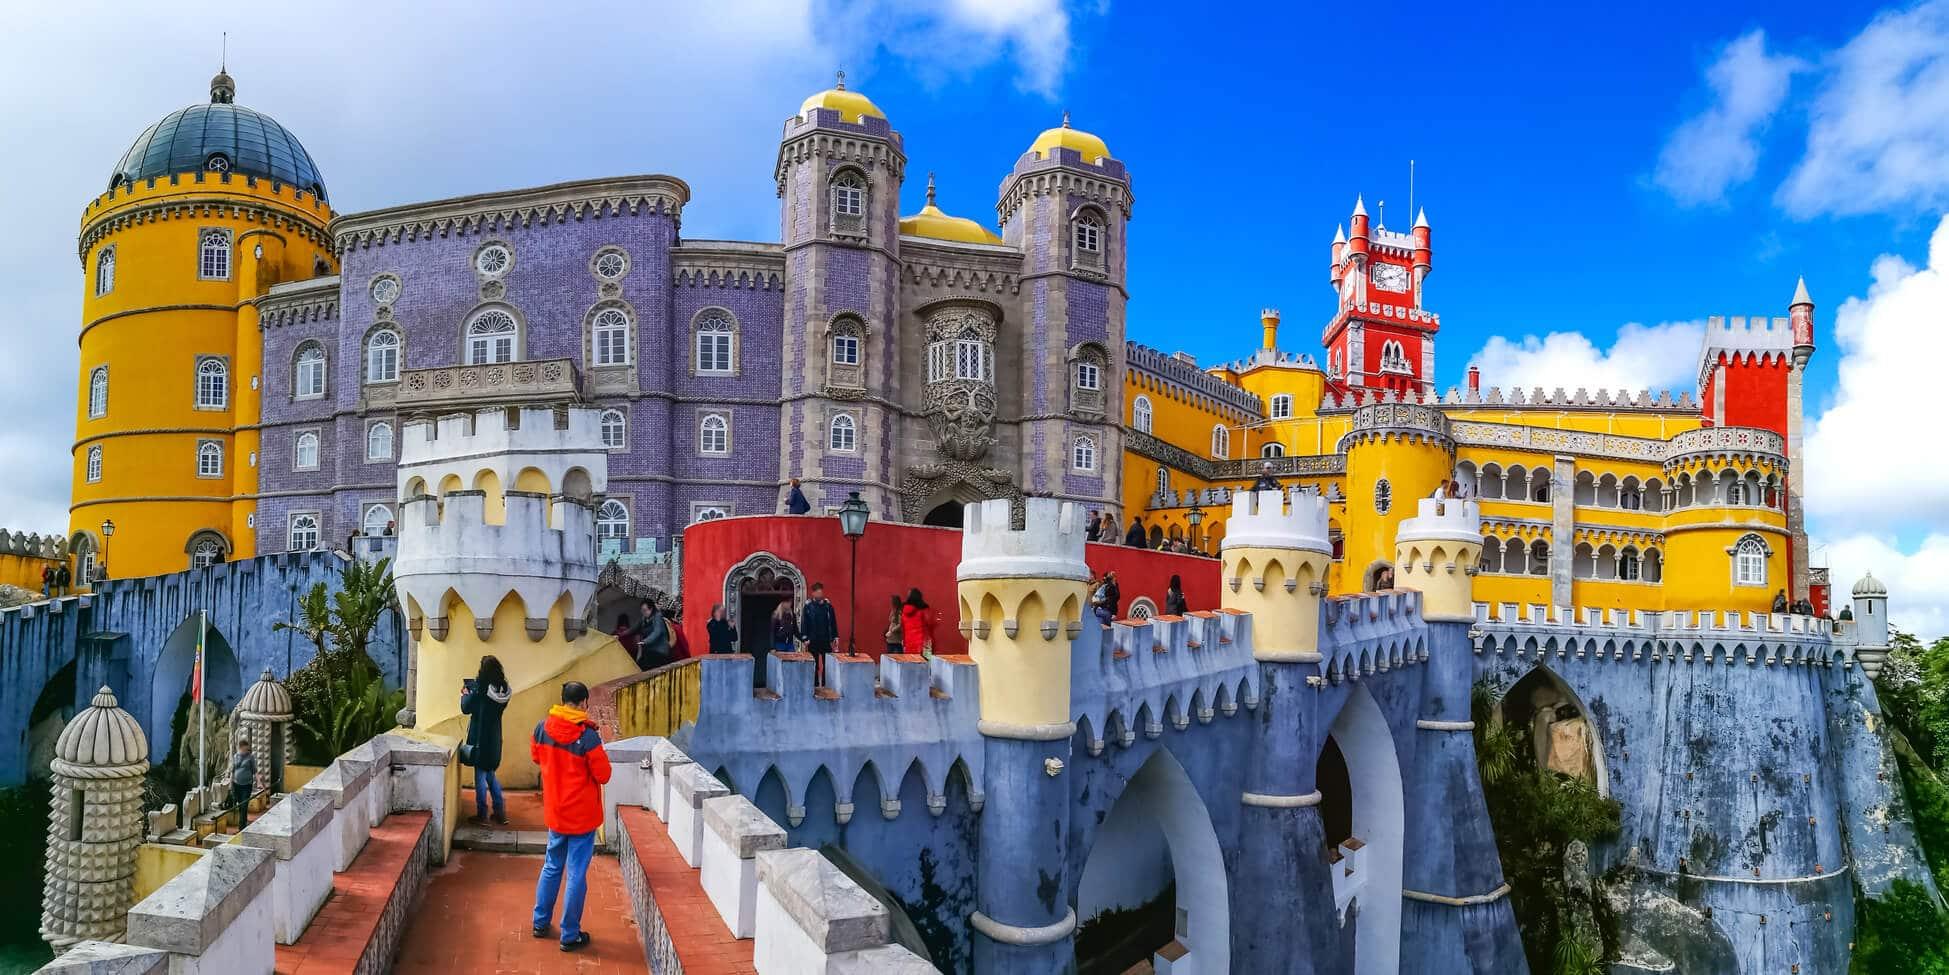 Visita Guiada Sintra: Sintra